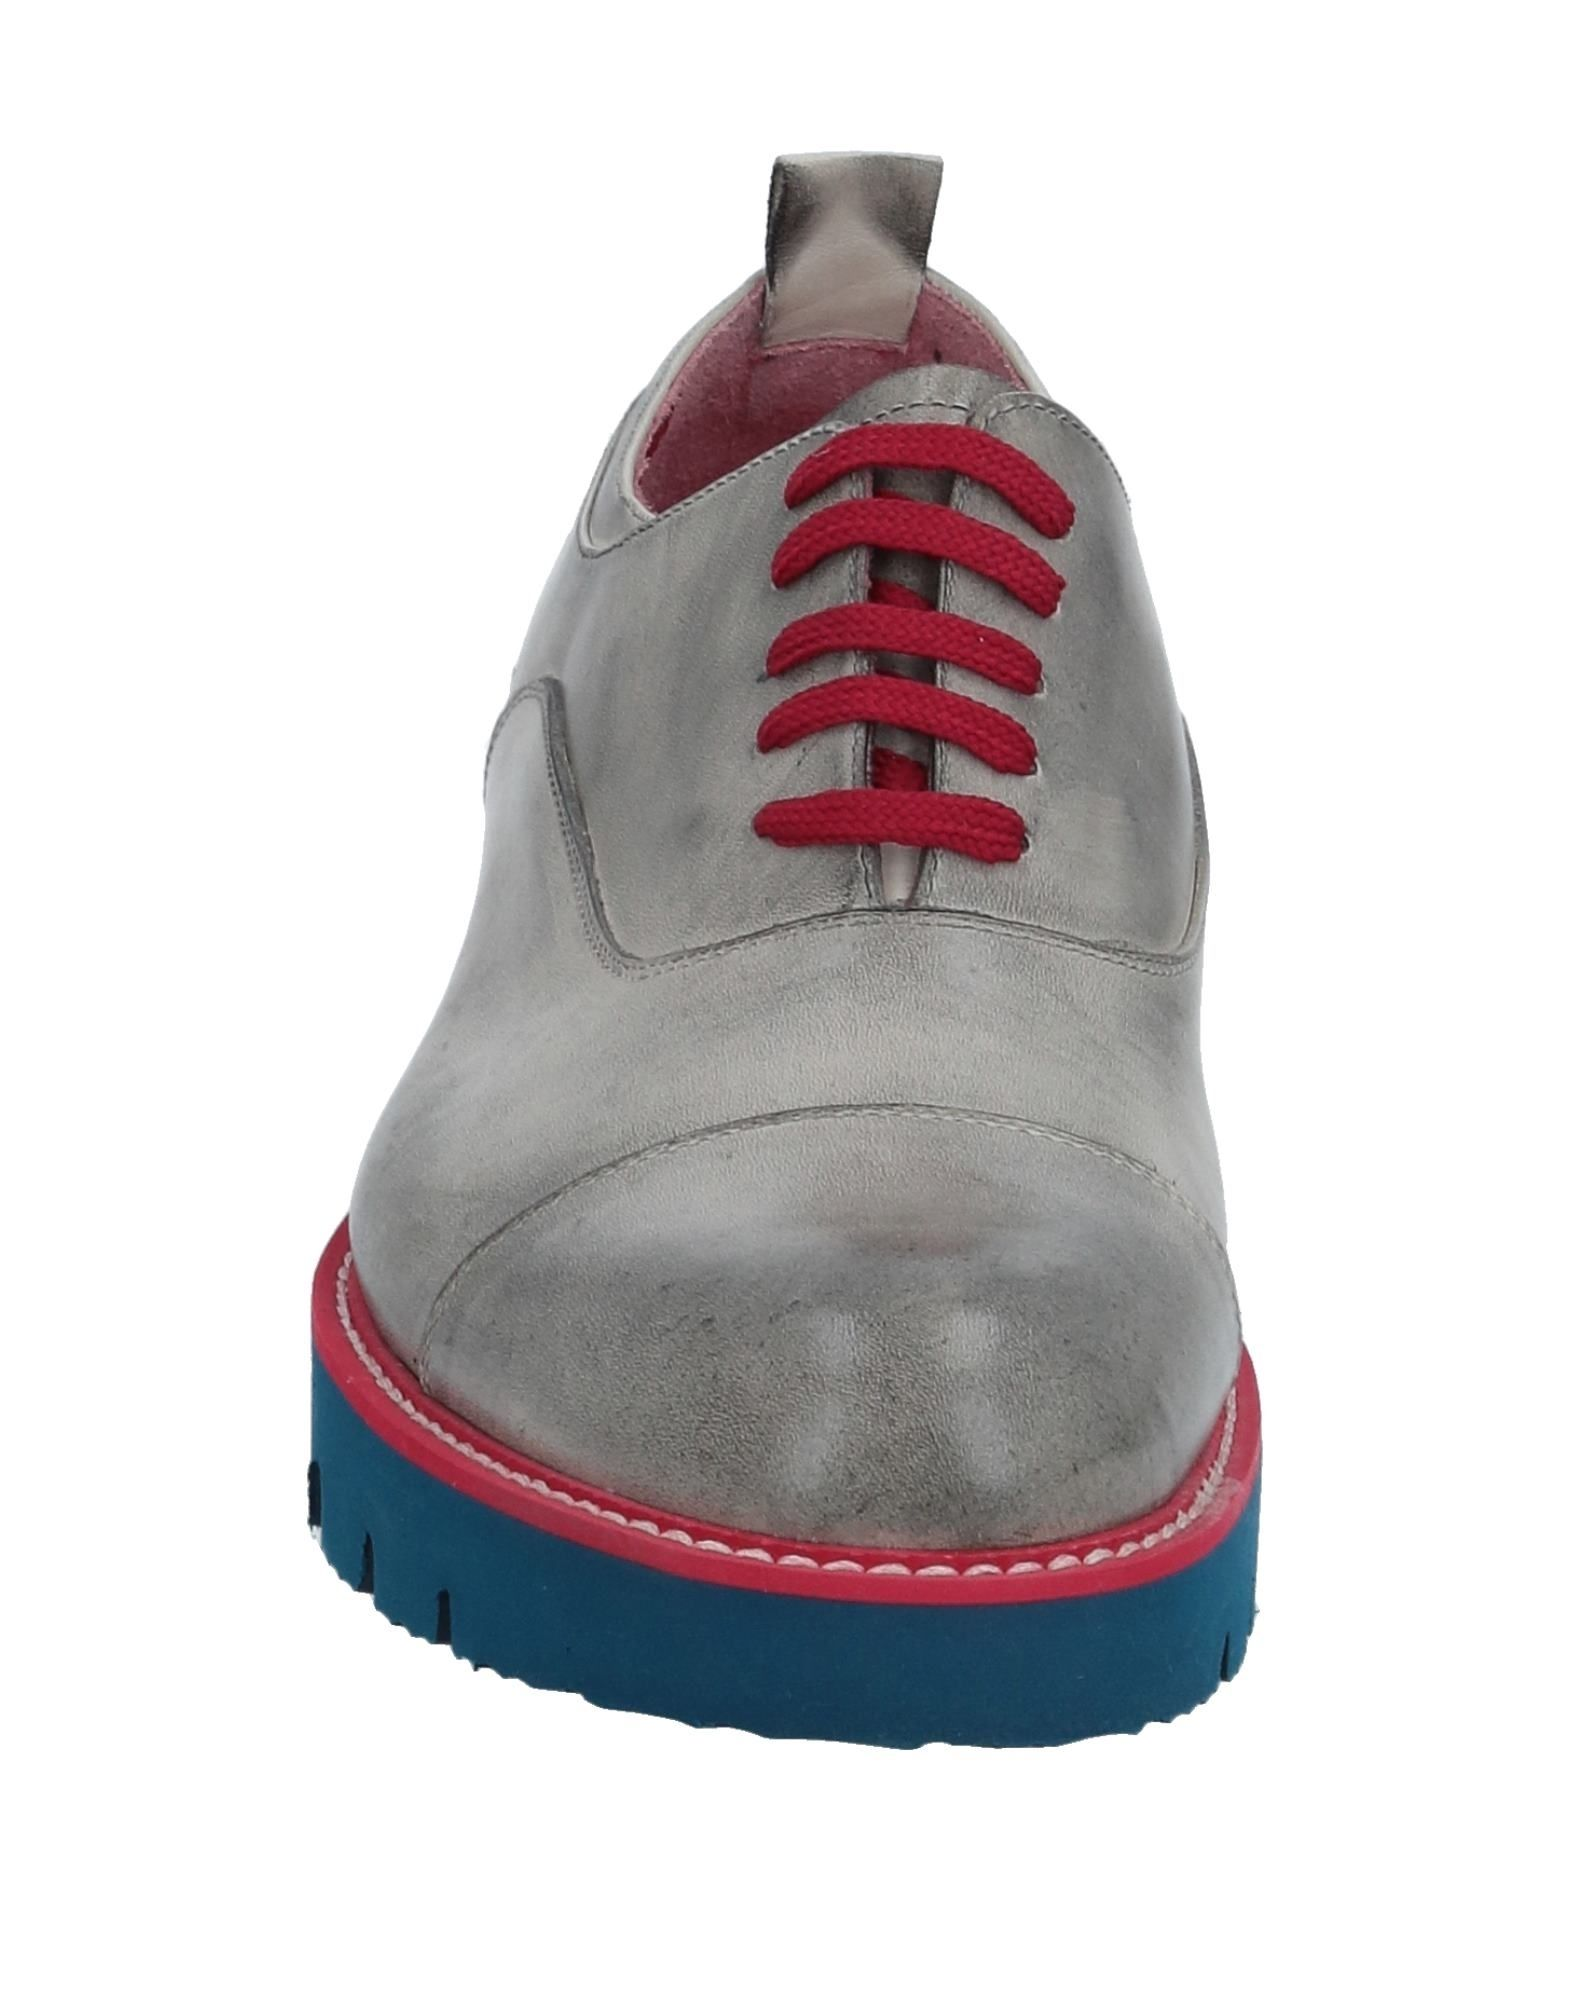 Rabatt echte Schuhe Onako' Mokassins 11523137LF Herren  11523137LF Mokassins 8243de